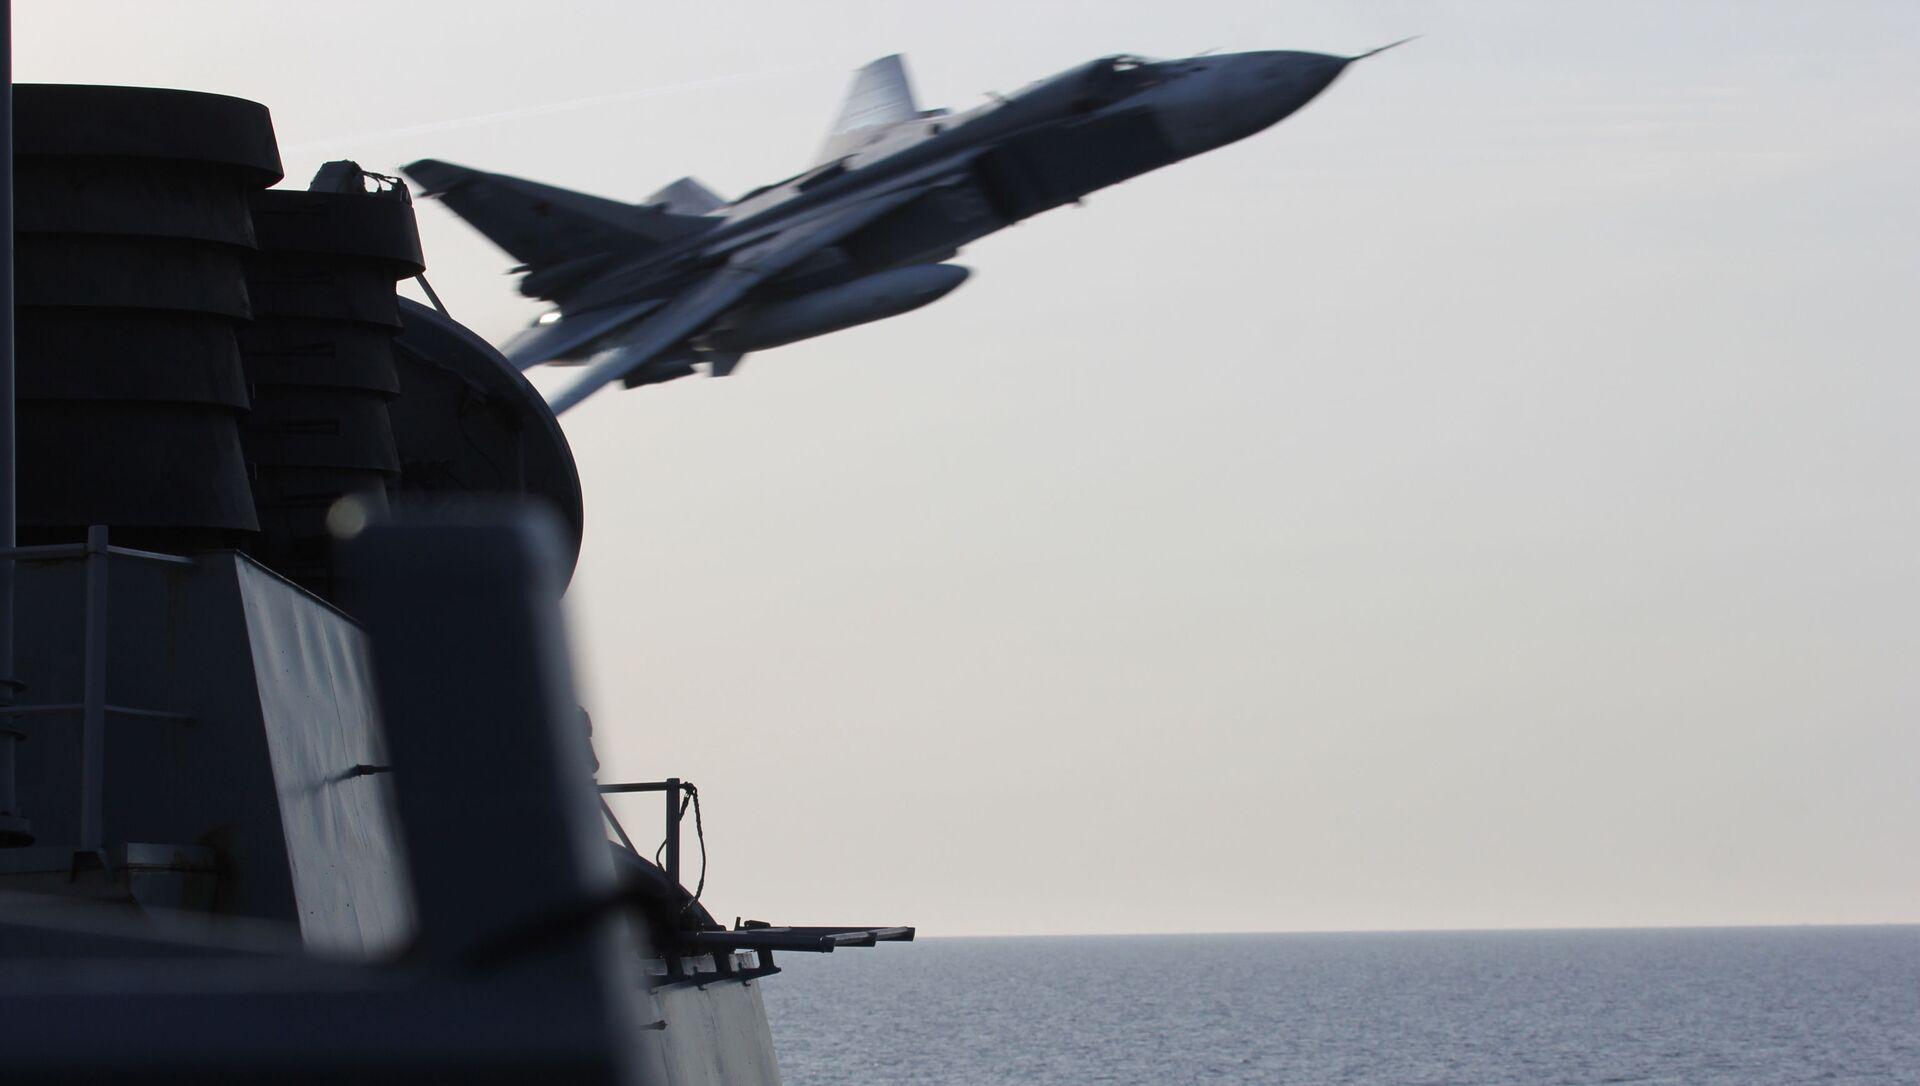 Caza Su-24 ruso sobrevolando el USS Donald Cook  - Sputnik Mundo, 1920, 02.02.2021